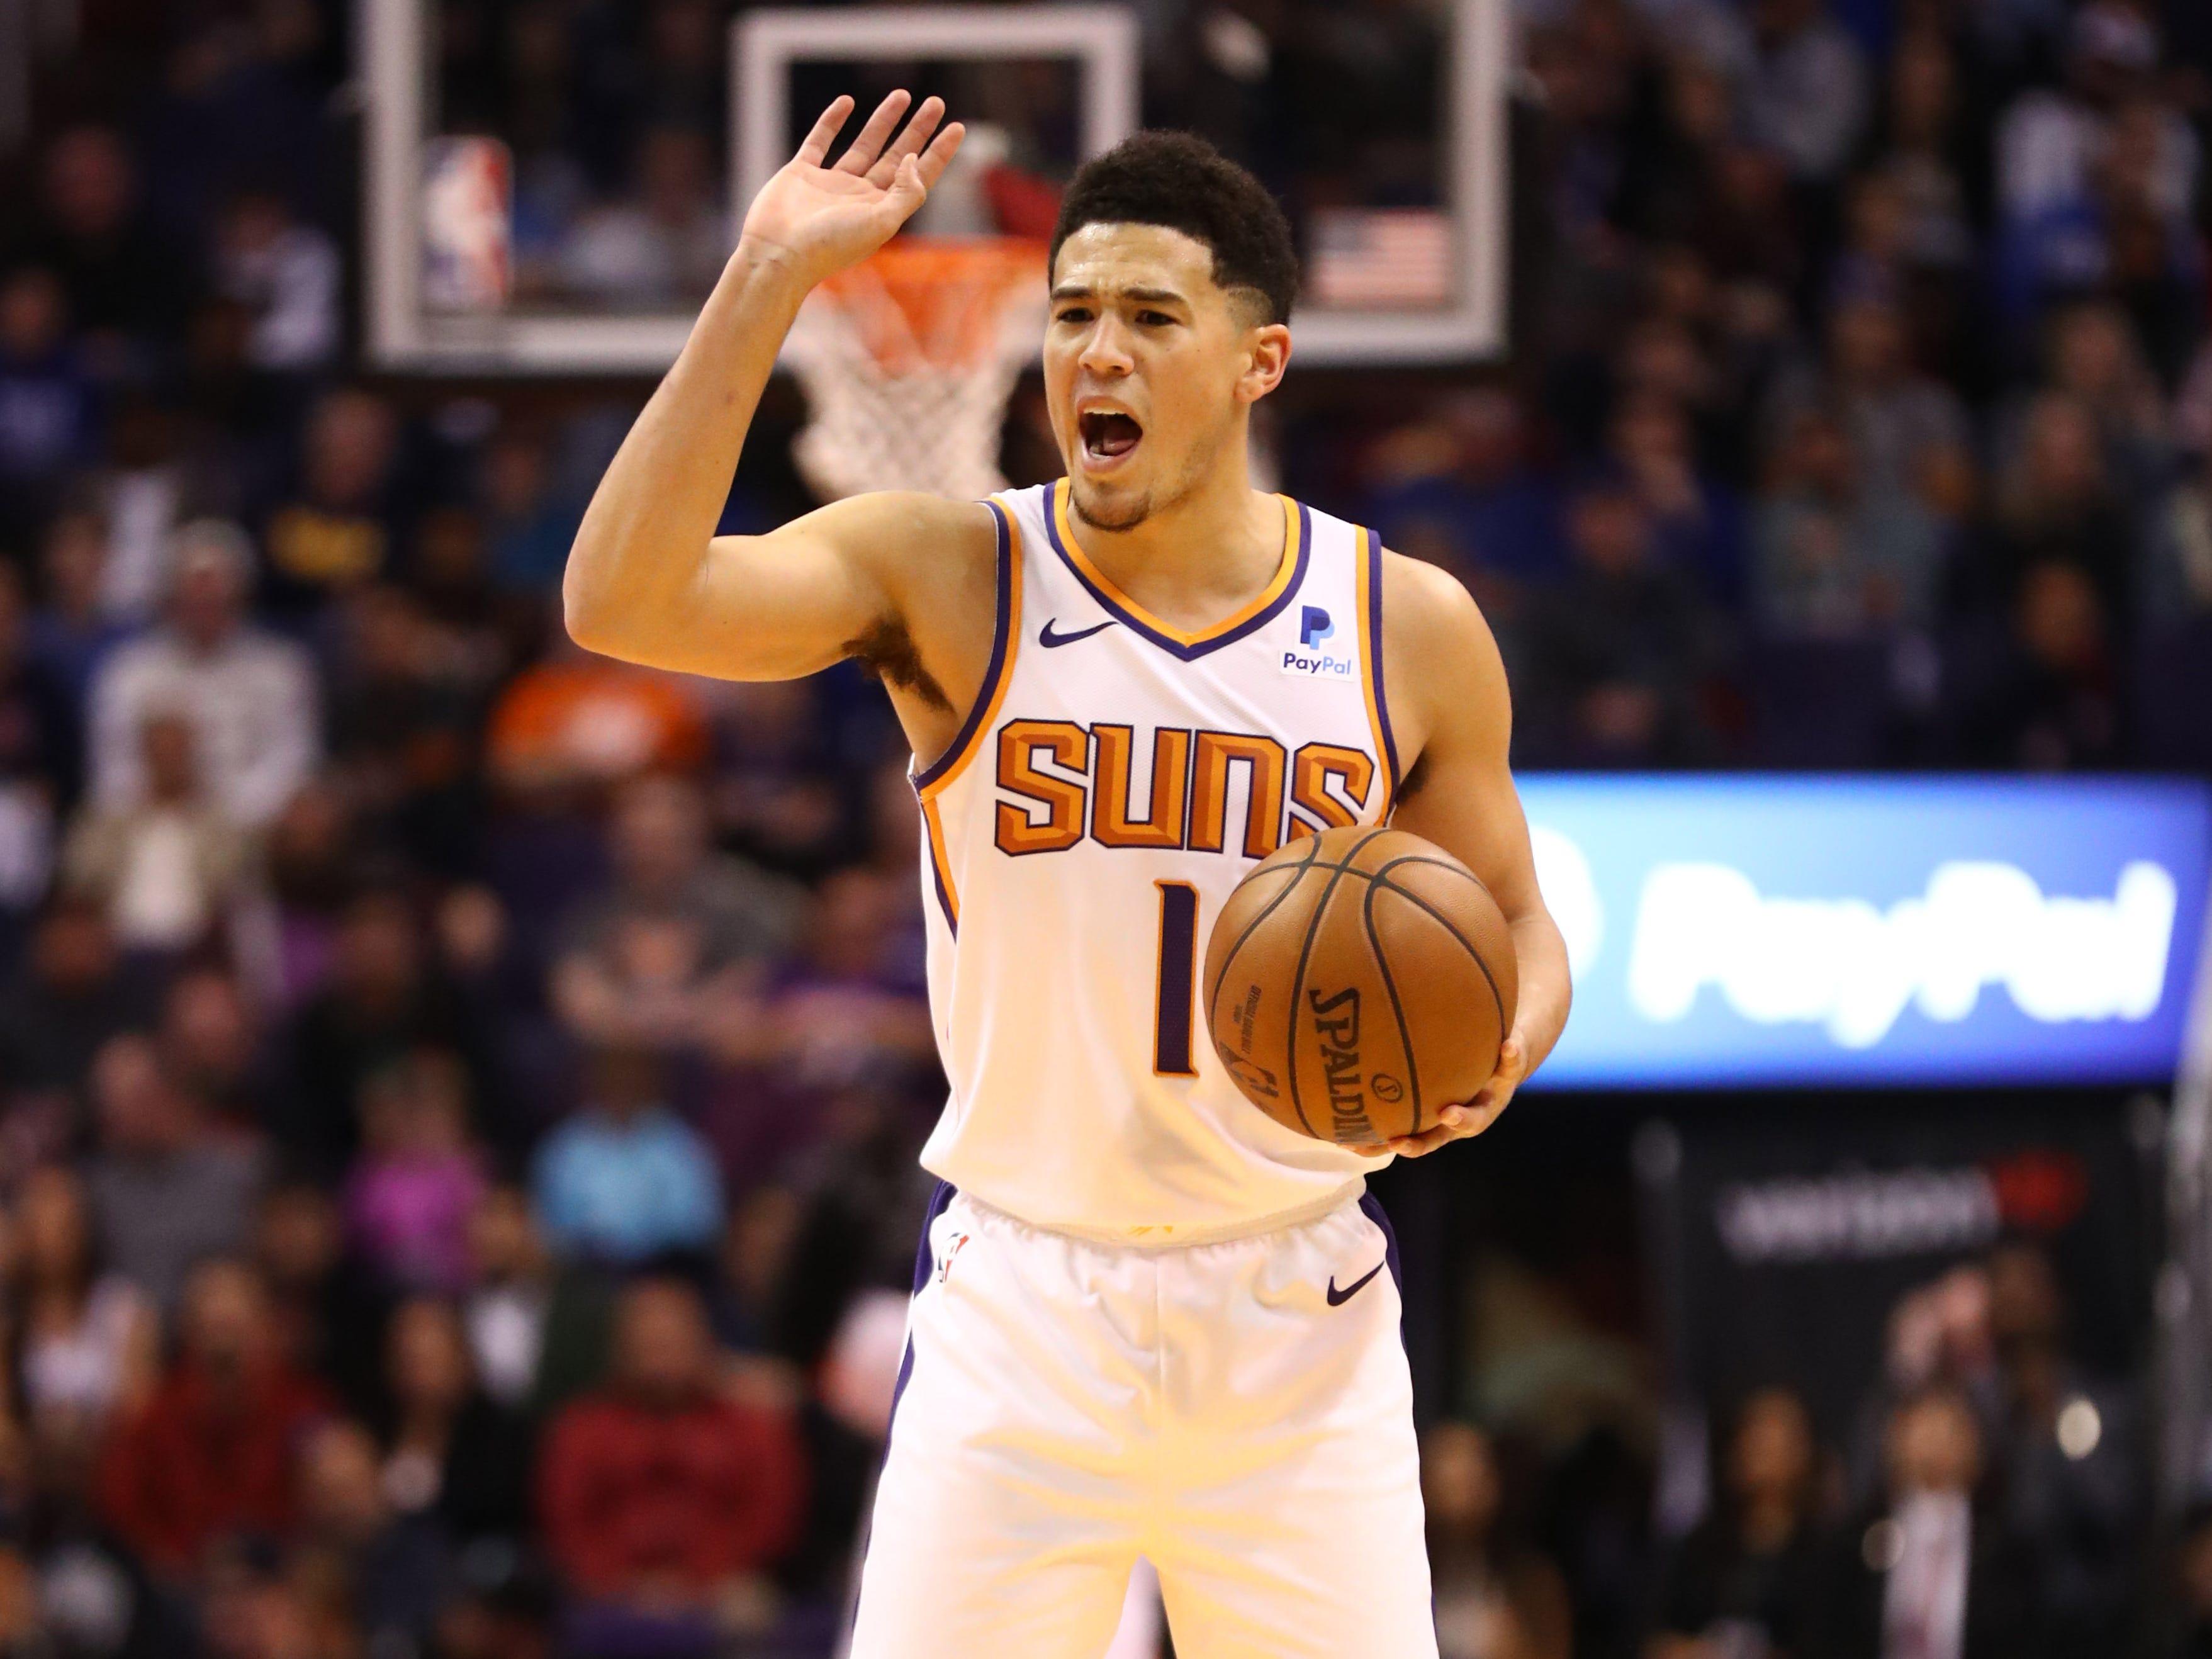 Jan 2, 2019; Phoenix, AZ, USA; Phoenix Suns guard Devin Booker (1) reacts against the Philadelphia 76ers in the first half at Talking Stick Resort Arena. Mandatory Credit: Mark J. Rebilas-USA TODAY Sports